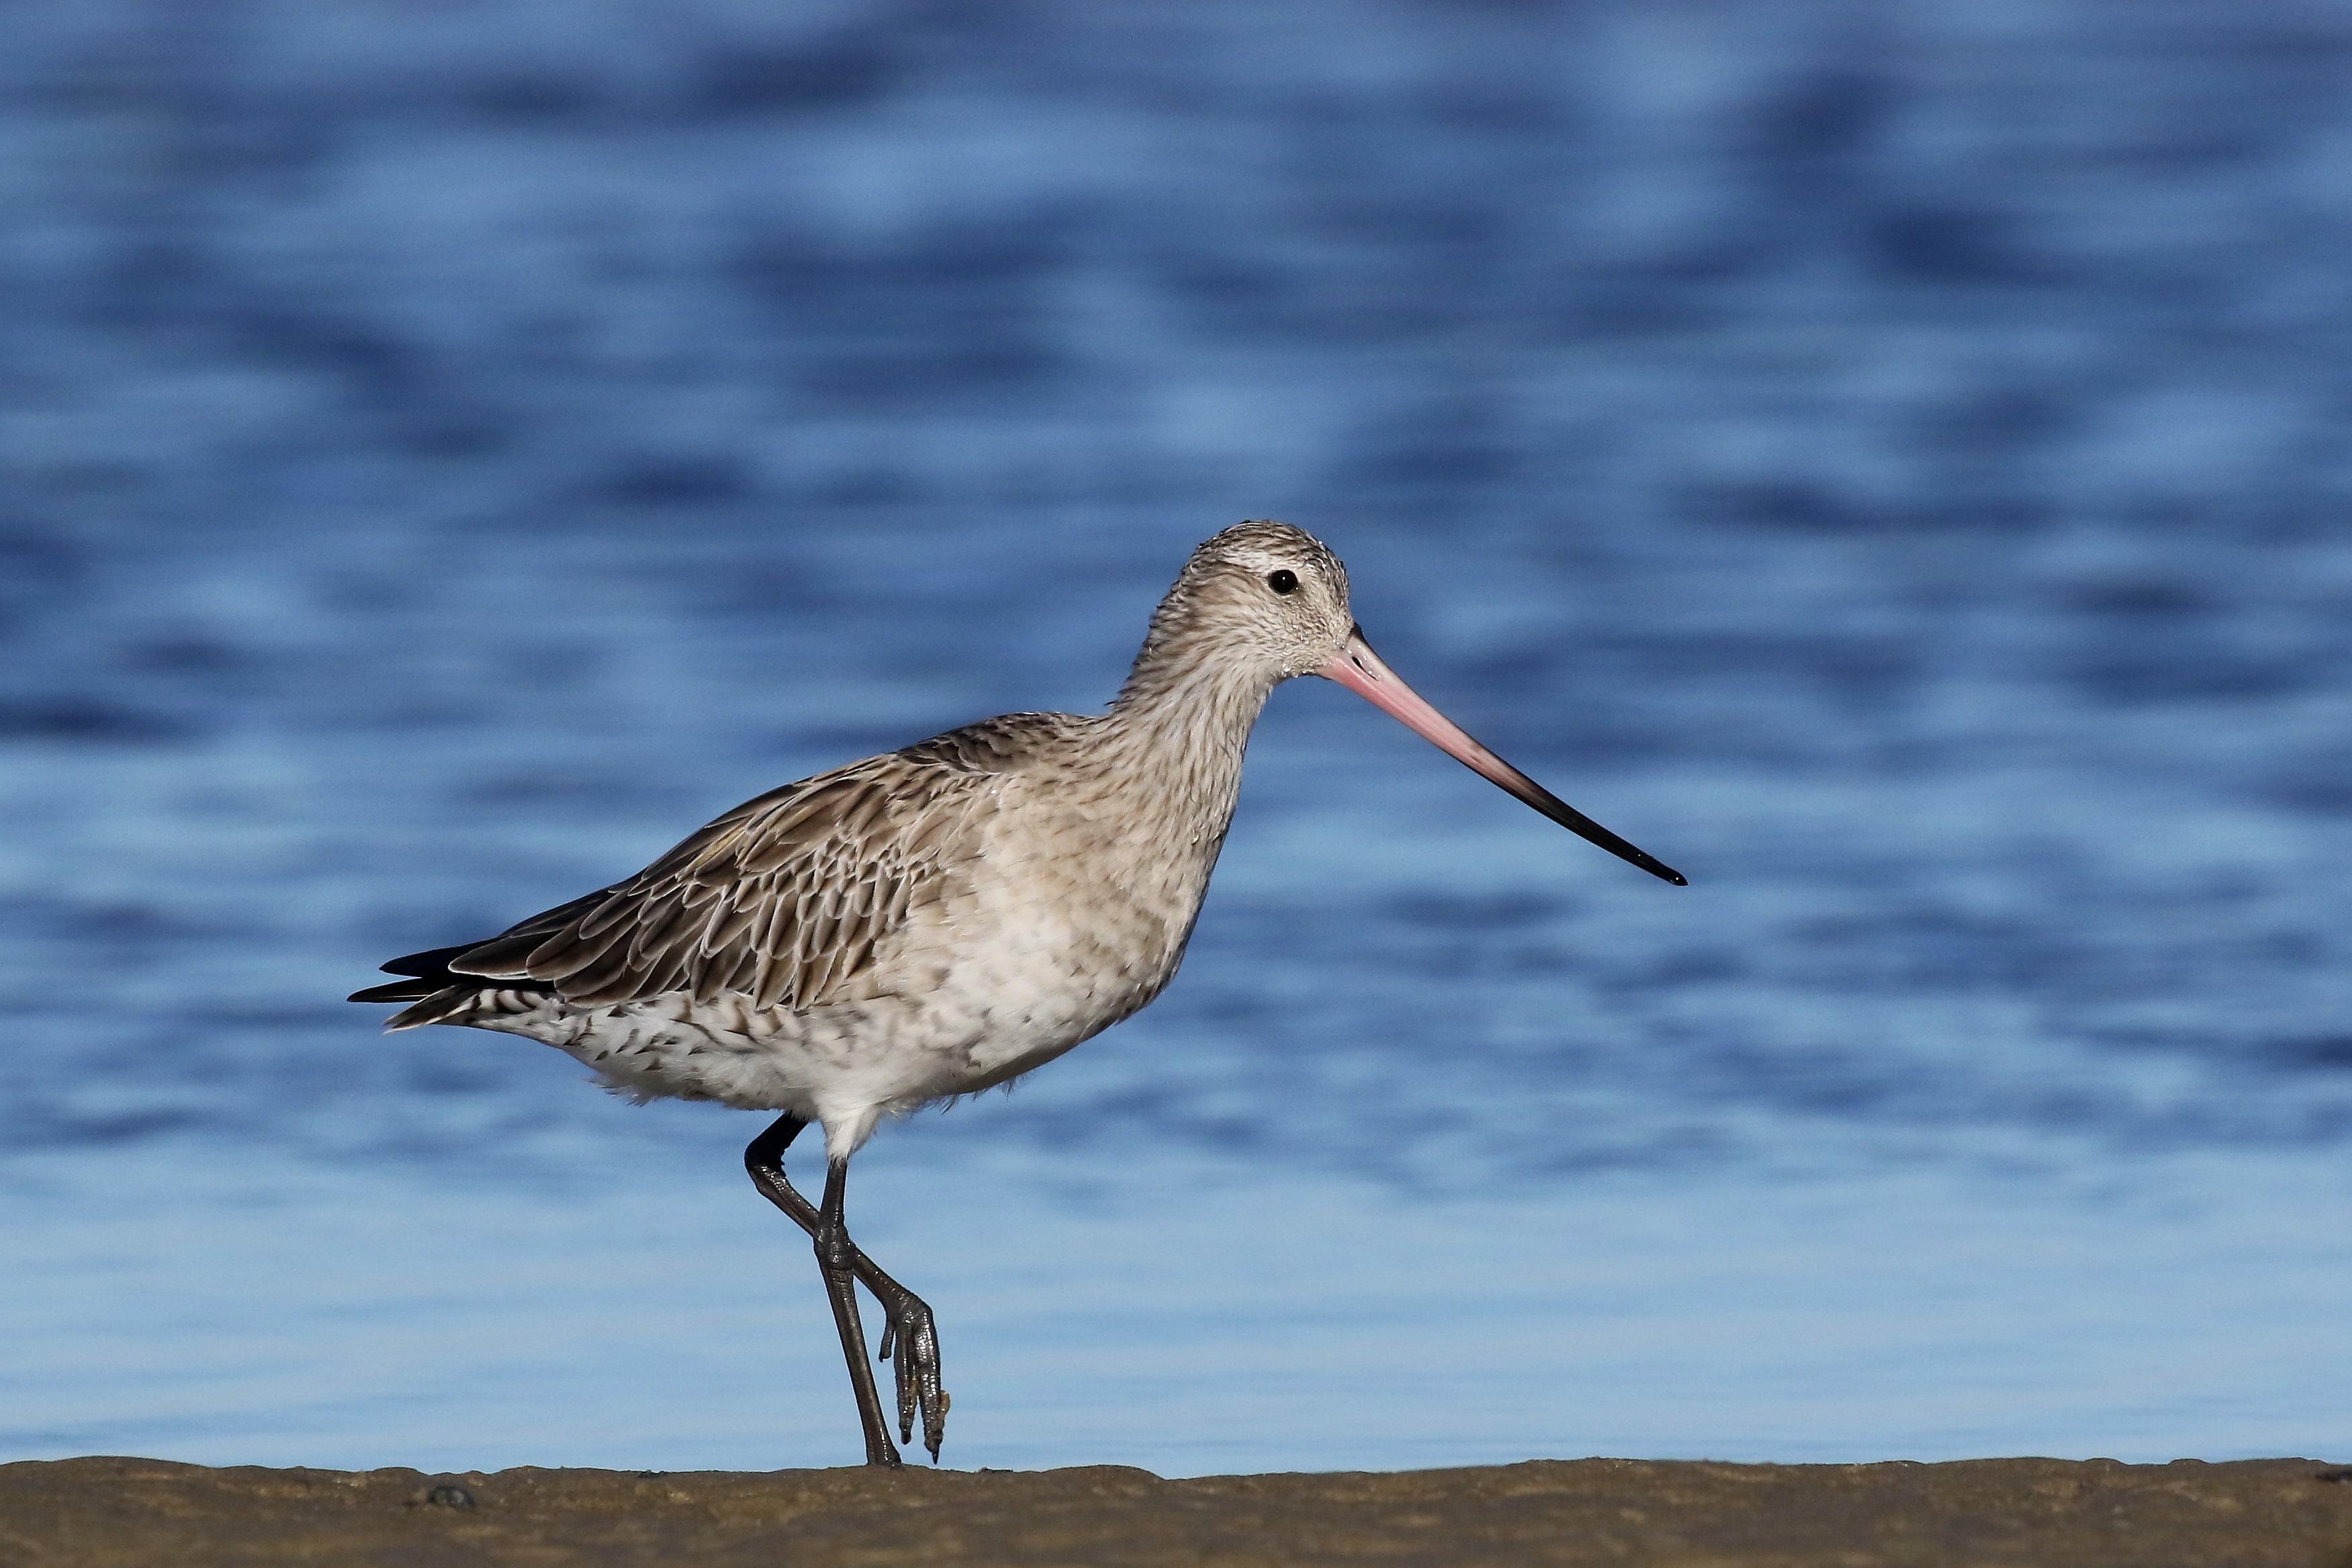 Bar-tailed Godwit by Bill Betts